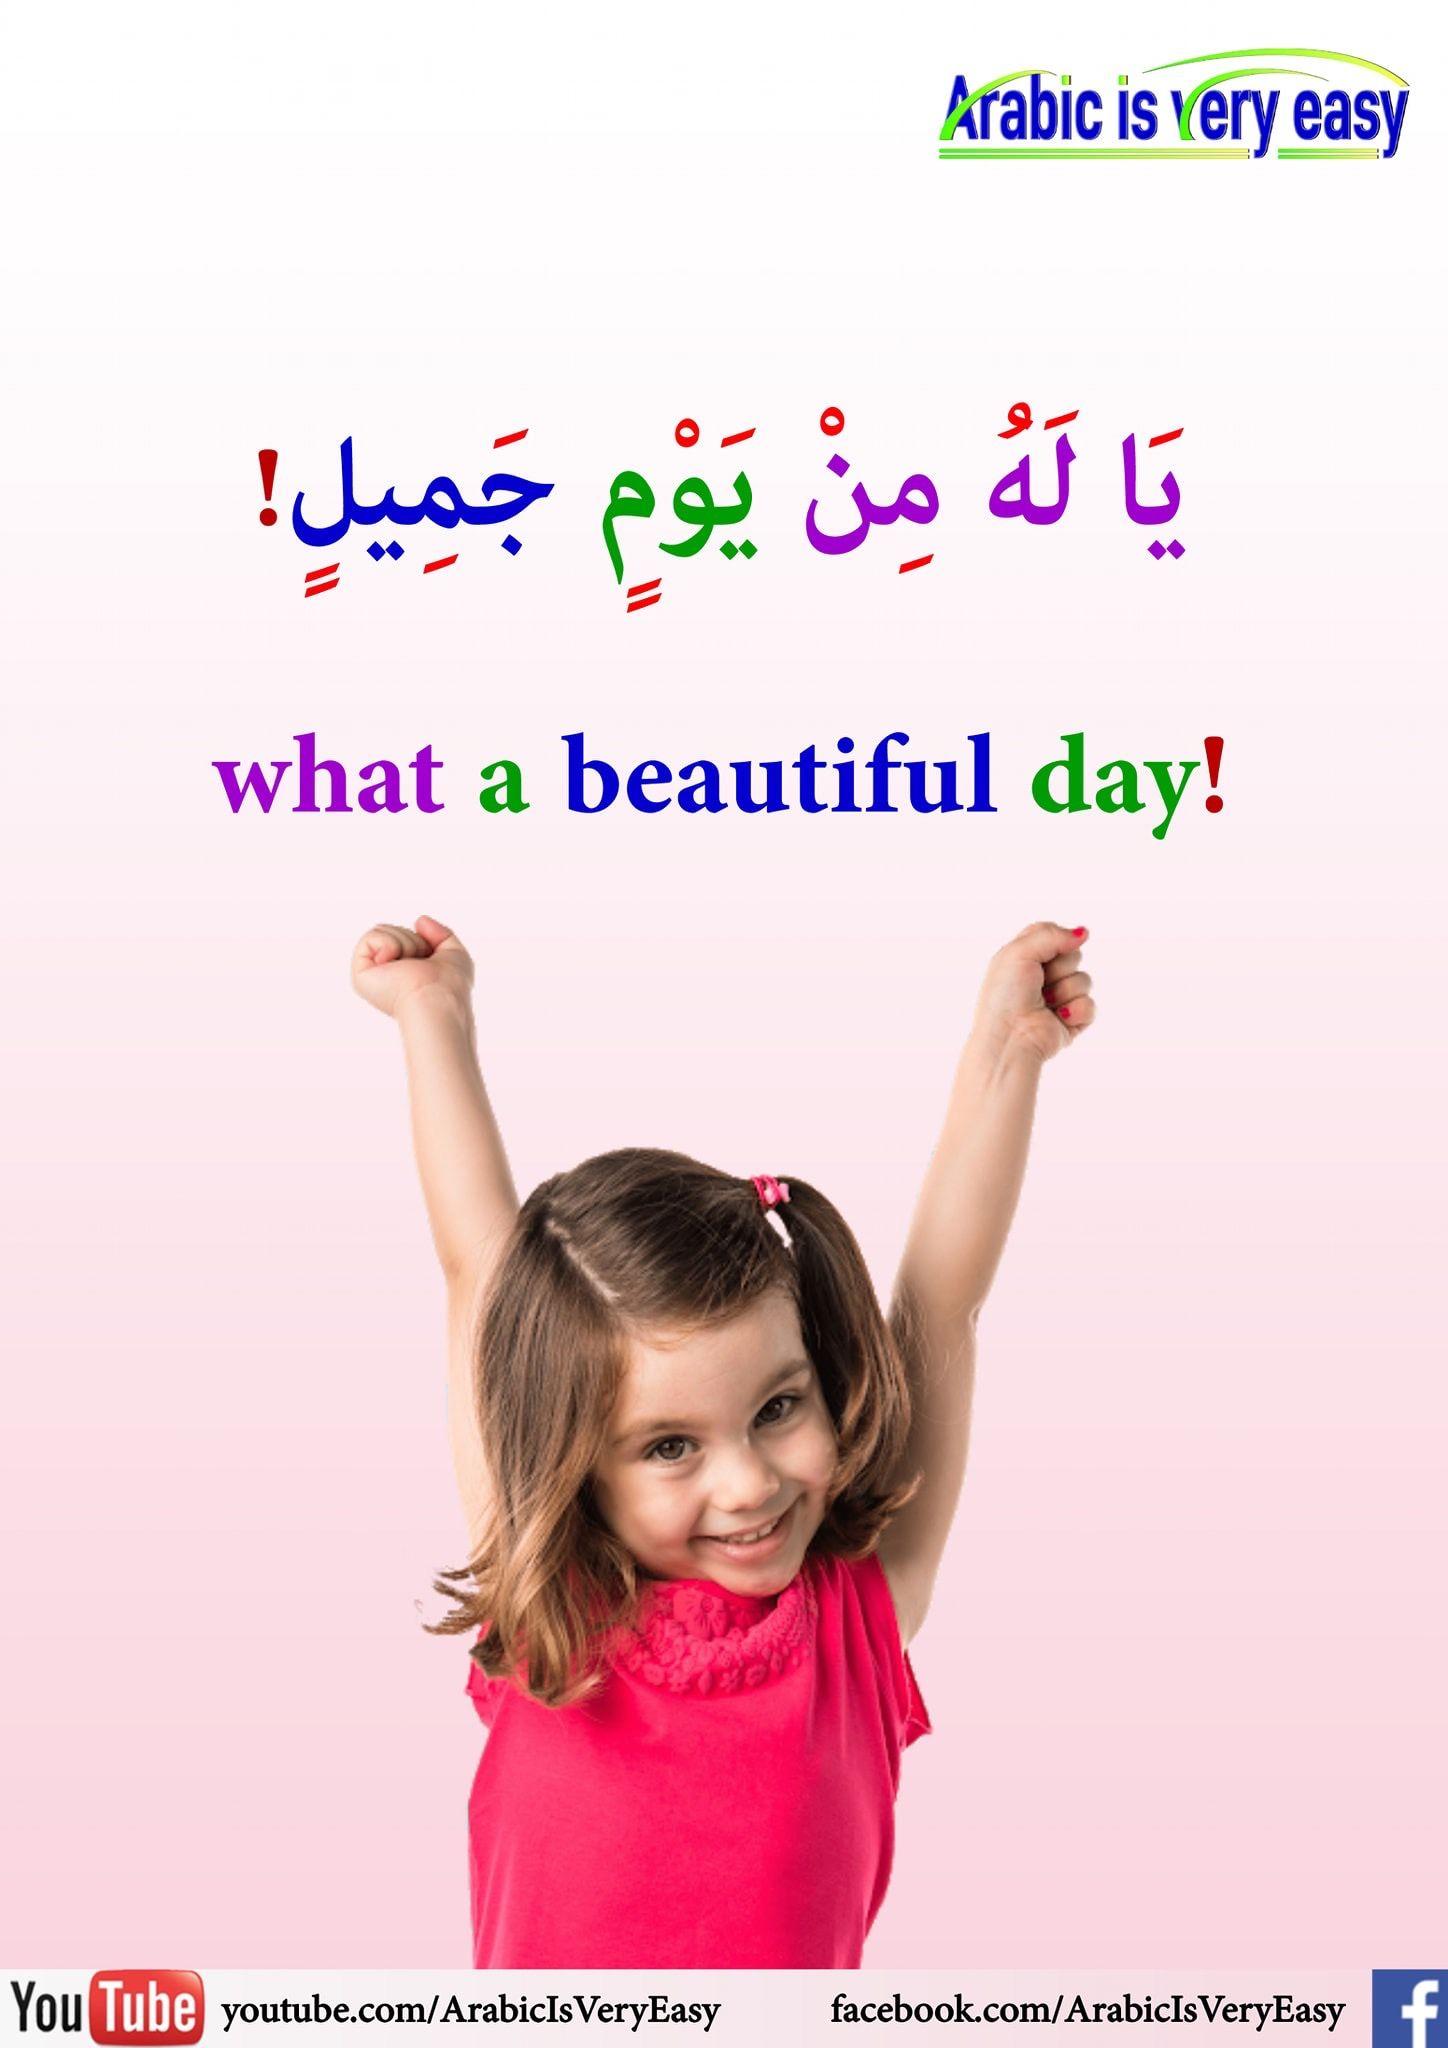 Learning Arabic Msa Fabiennem English Language Learning Grammar Learn Arabic Language Learning Arabic